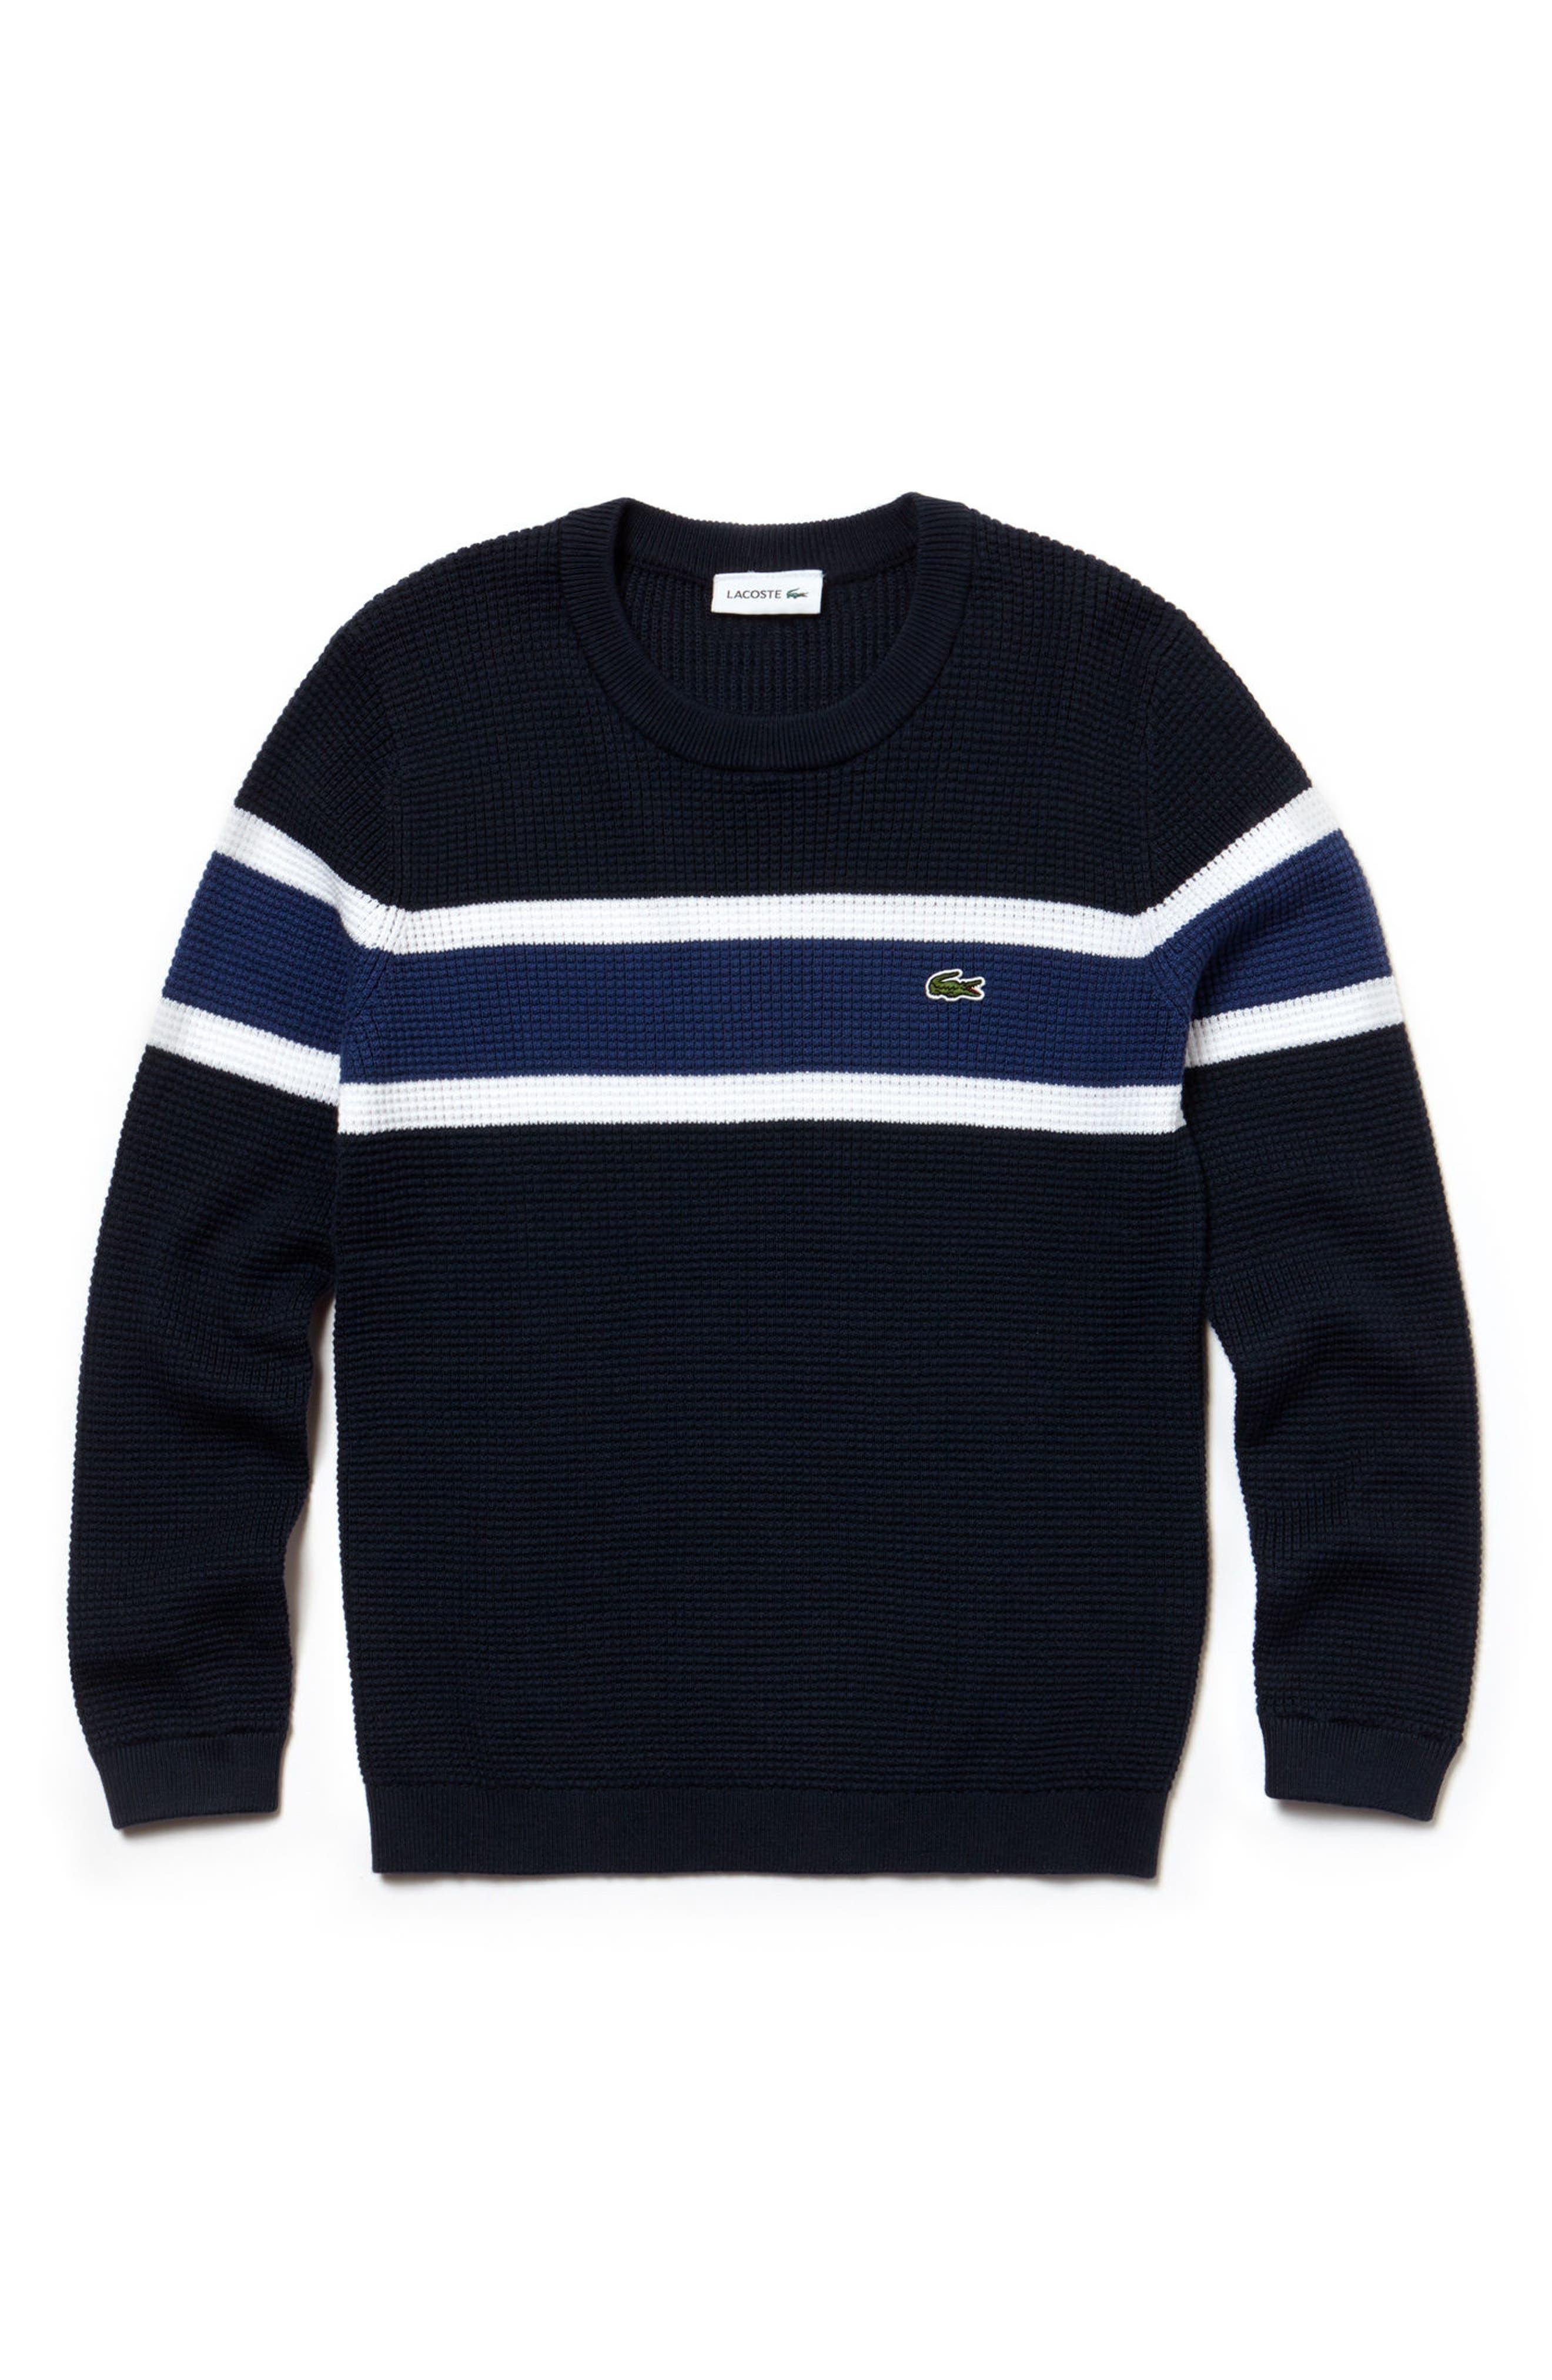 Piqué Effect Knit Sweater,                         Main,                         color, Navy Blue/ White